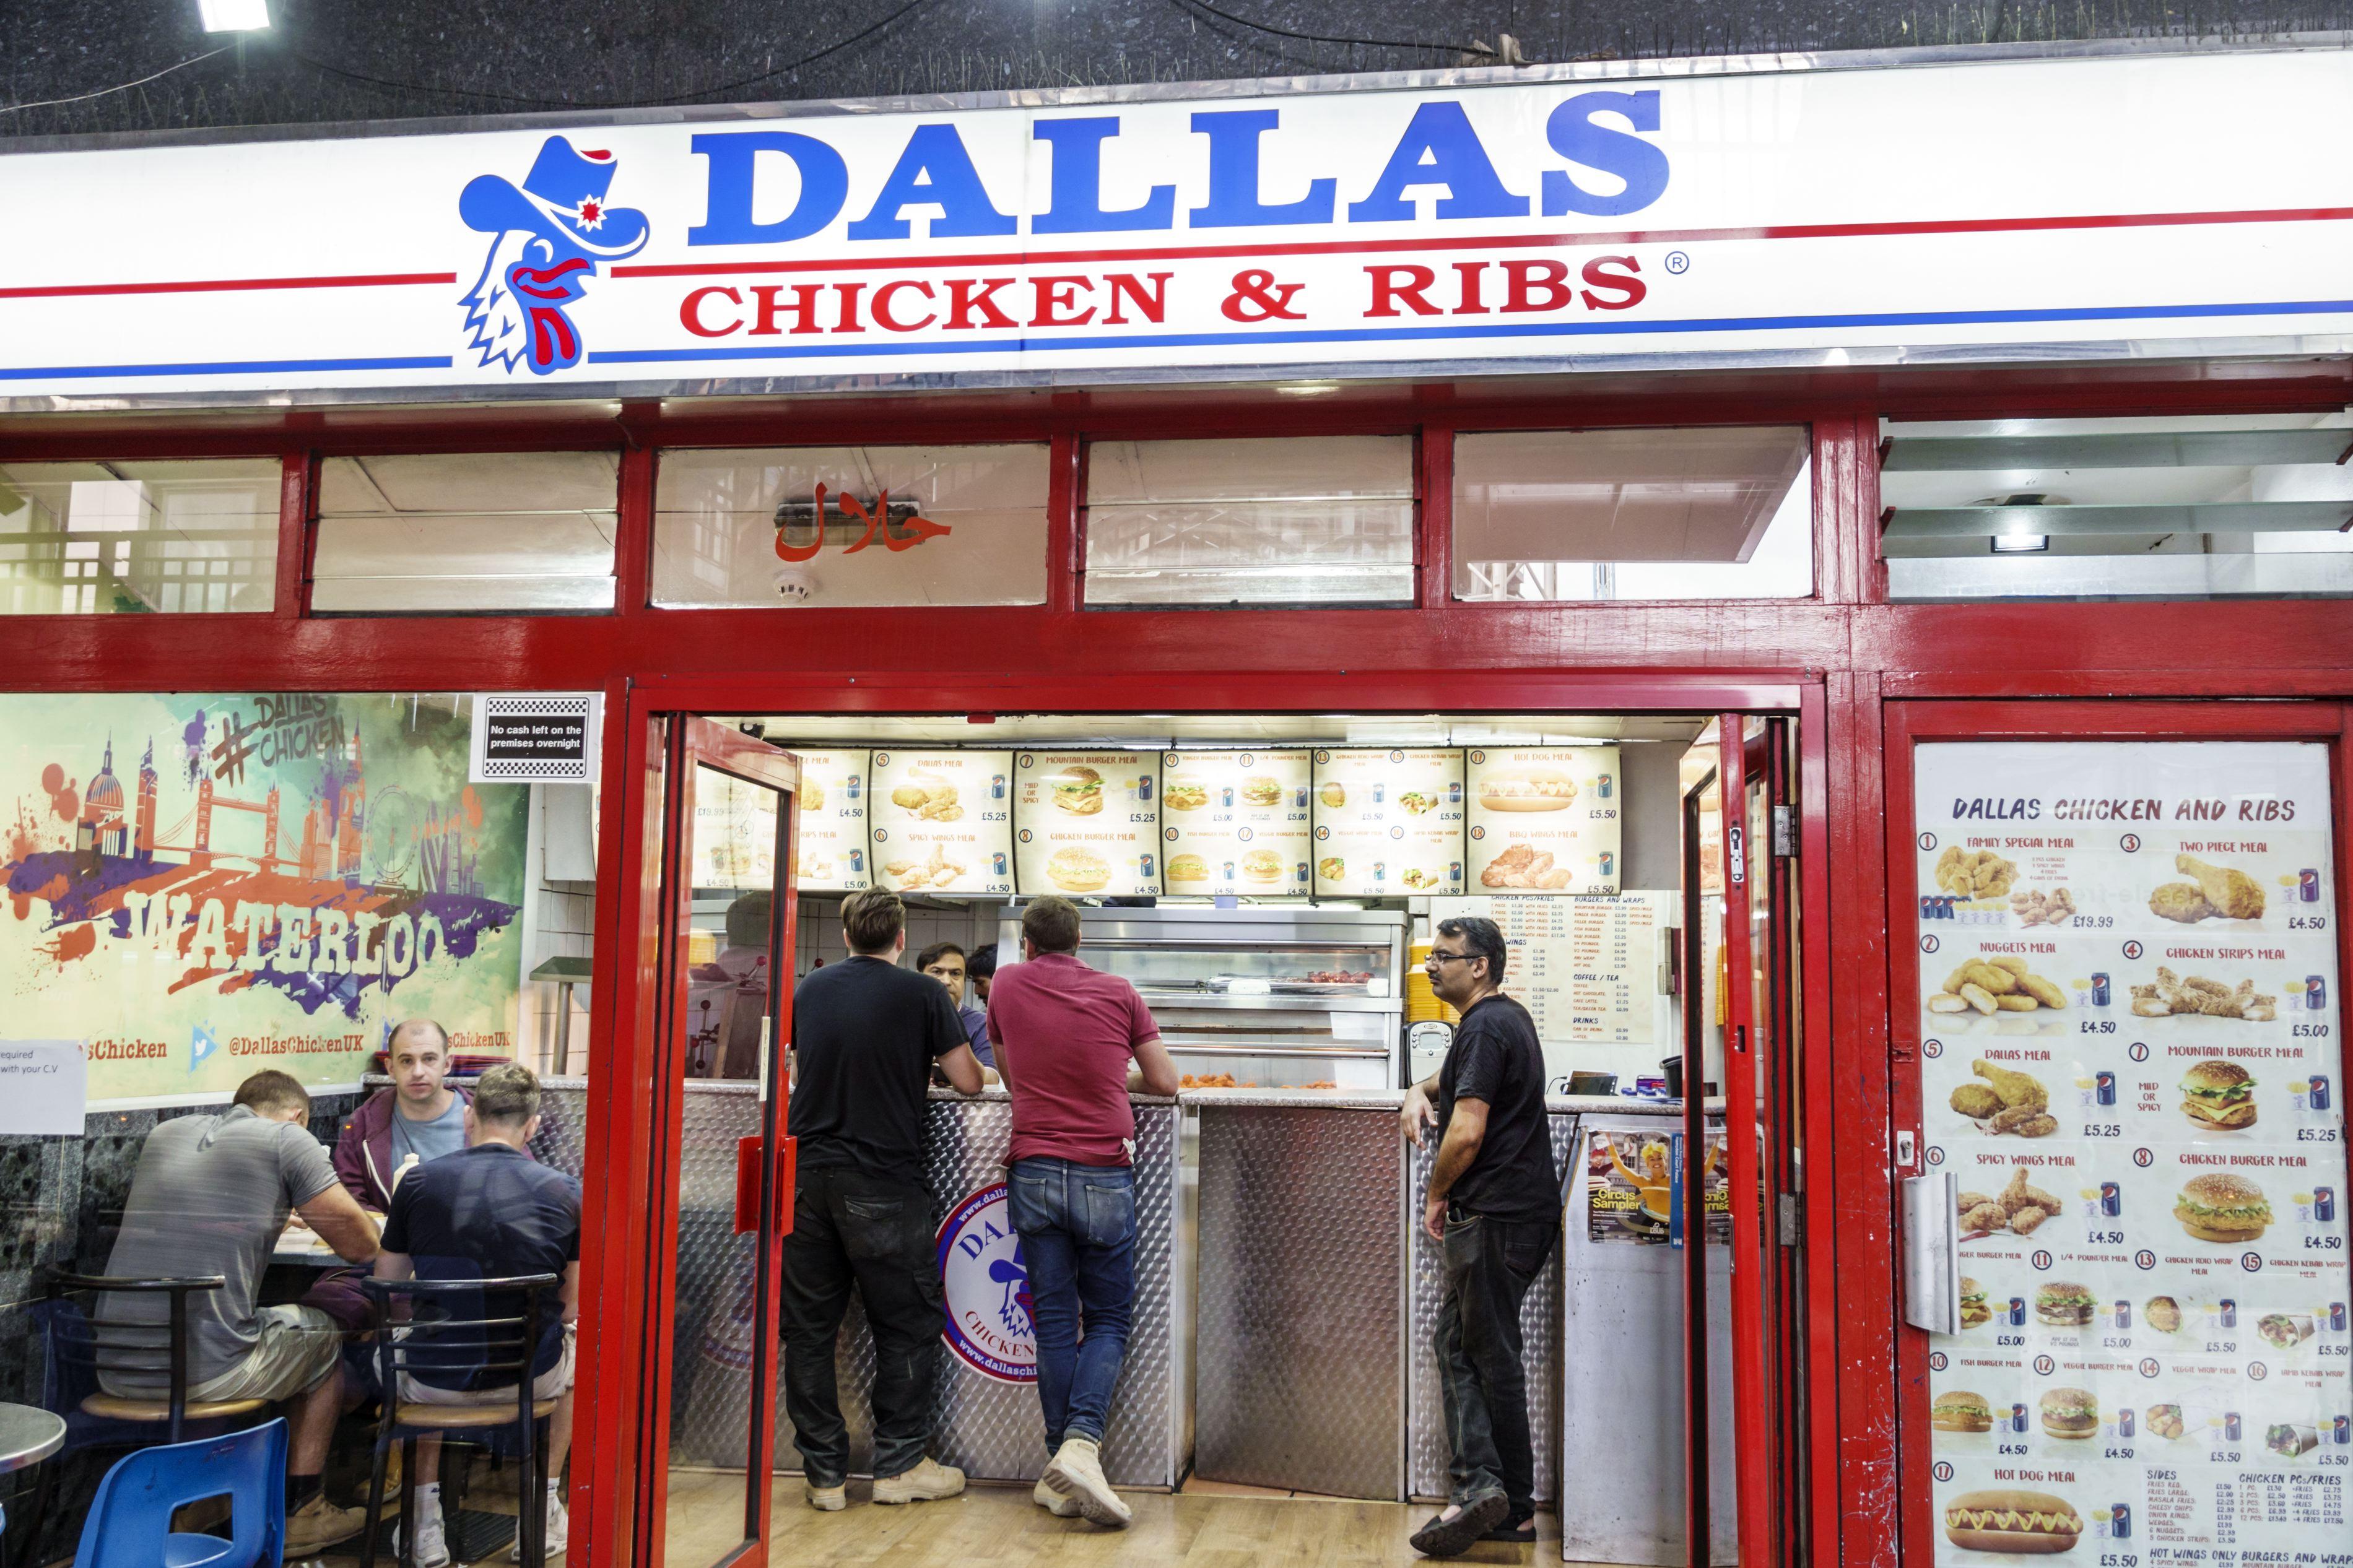 Dallas Chicken & Ribs, a Halal take-away in London.